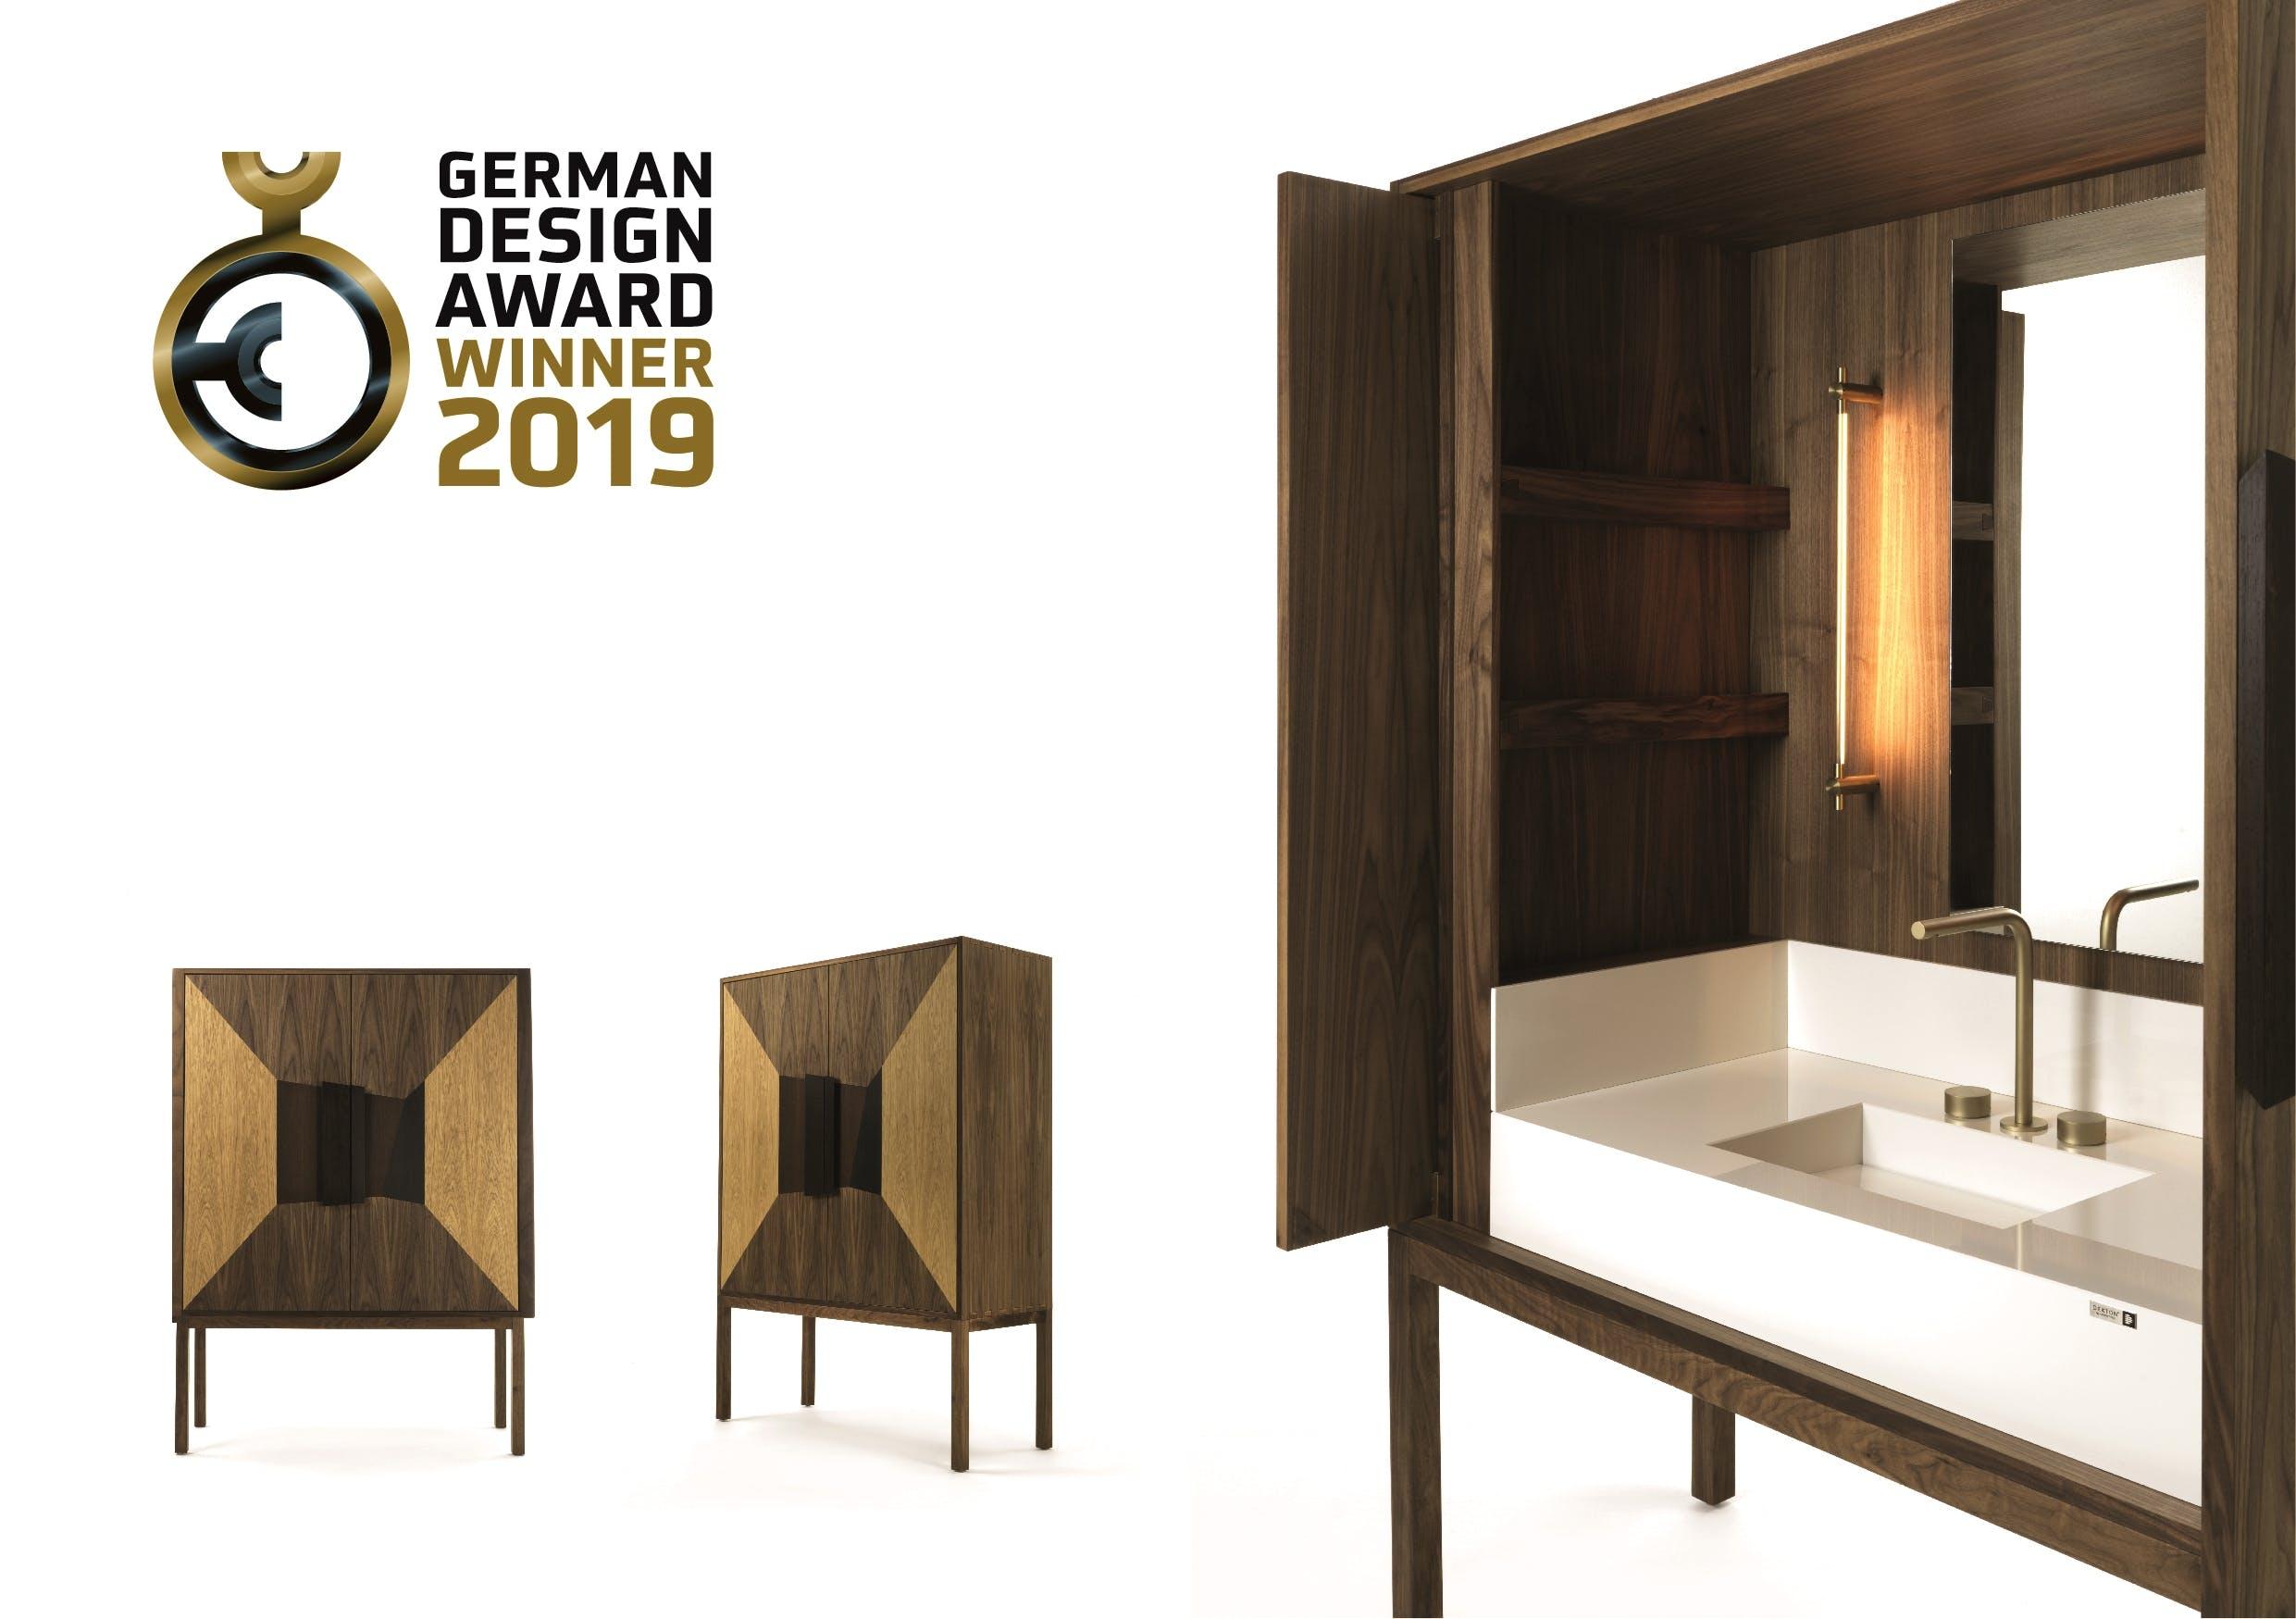 Image of Dekauri German Design Award 2019 2 in DeKauri, German Design Award 2019 - Cosentino